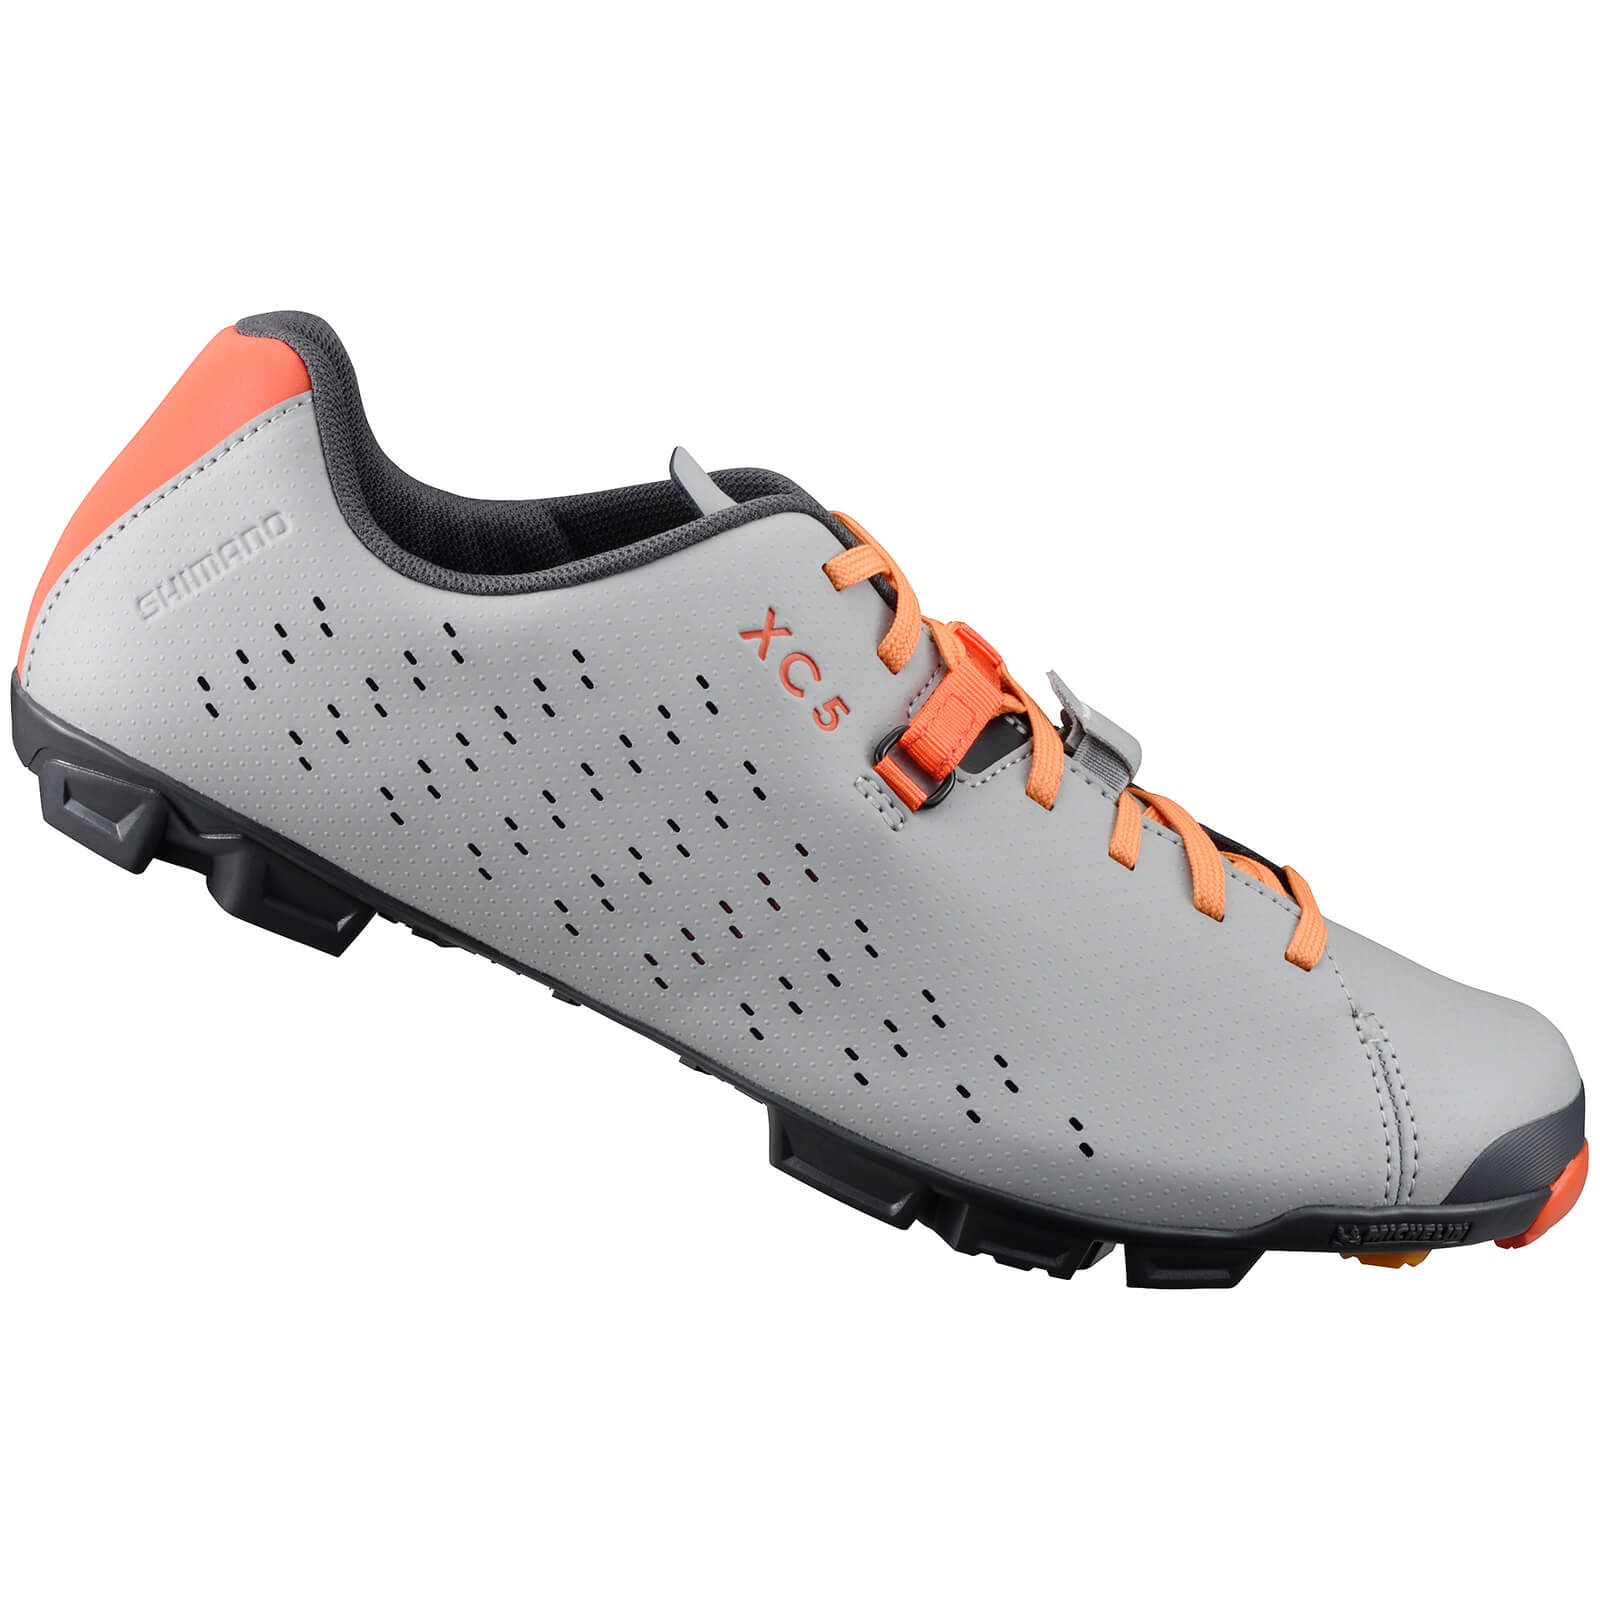 Shimano XC5 MTB Shoes - Grey/Orange - UK 9/EU 44